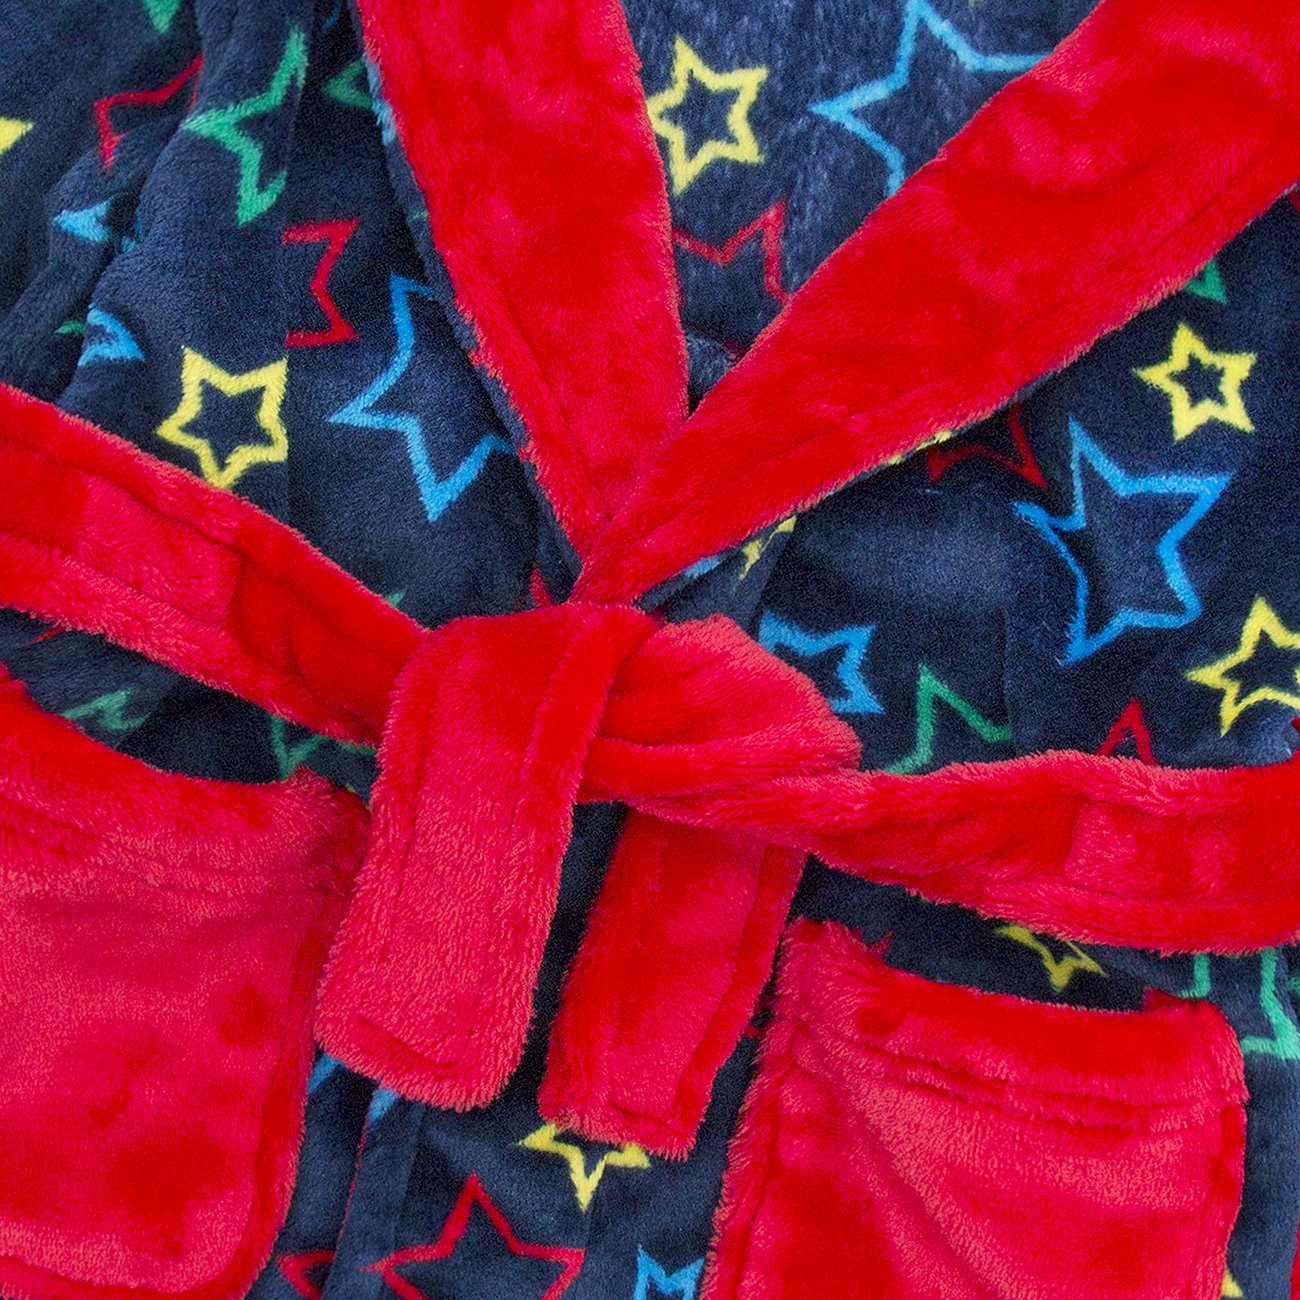 Minikidz Infant Girls Boys Unisex Star Print Flannel Fleece Hooded Dressing Gown Robe